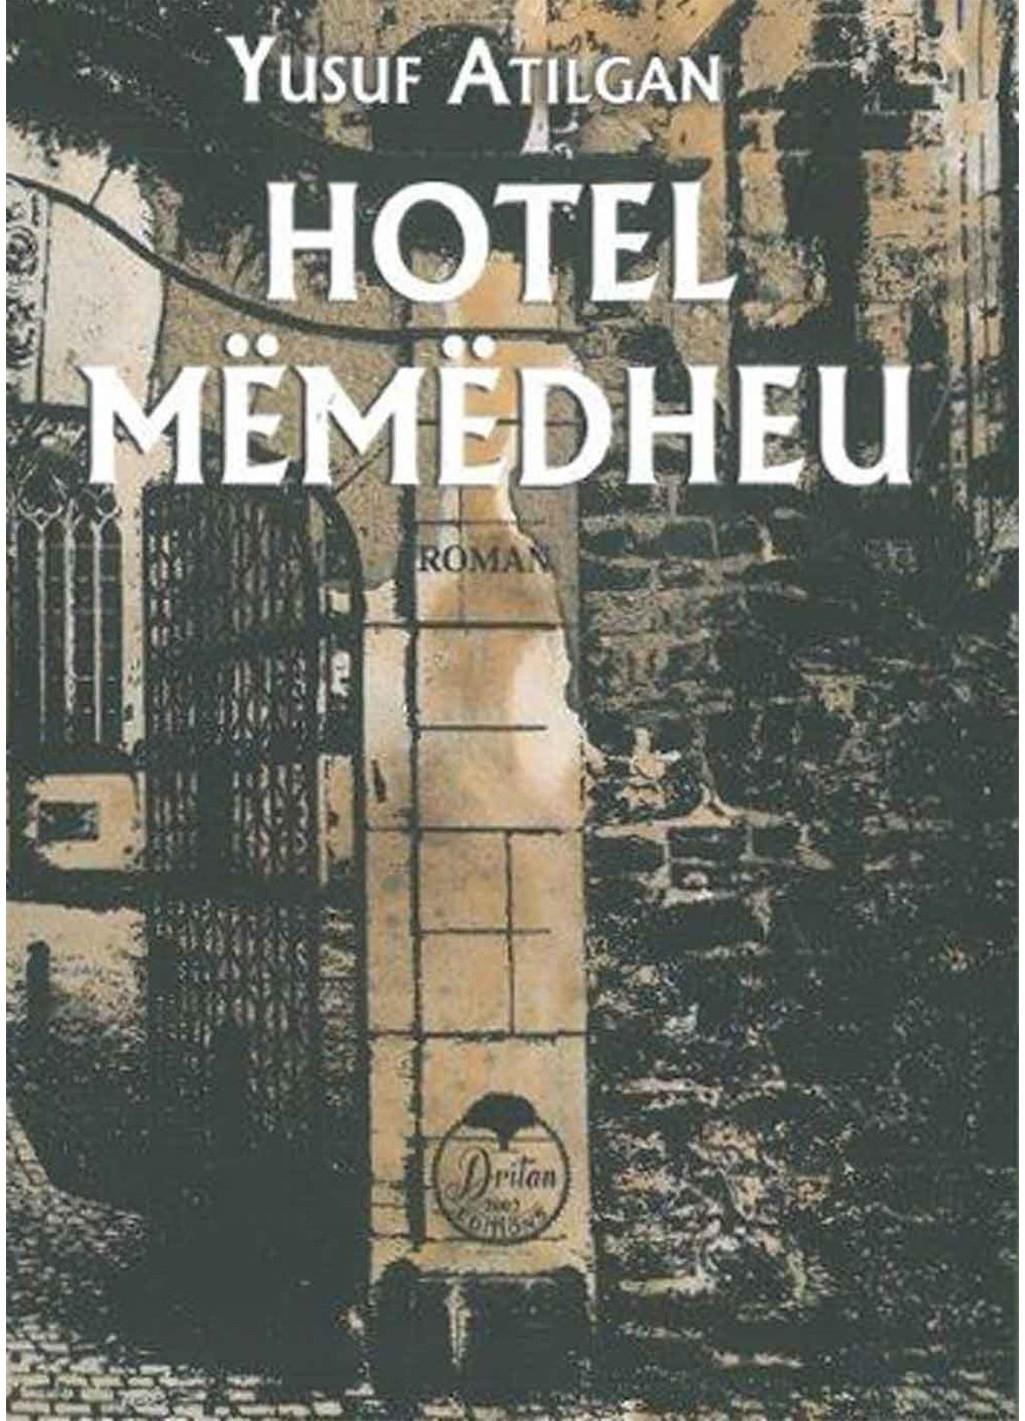 Hotel memedheu